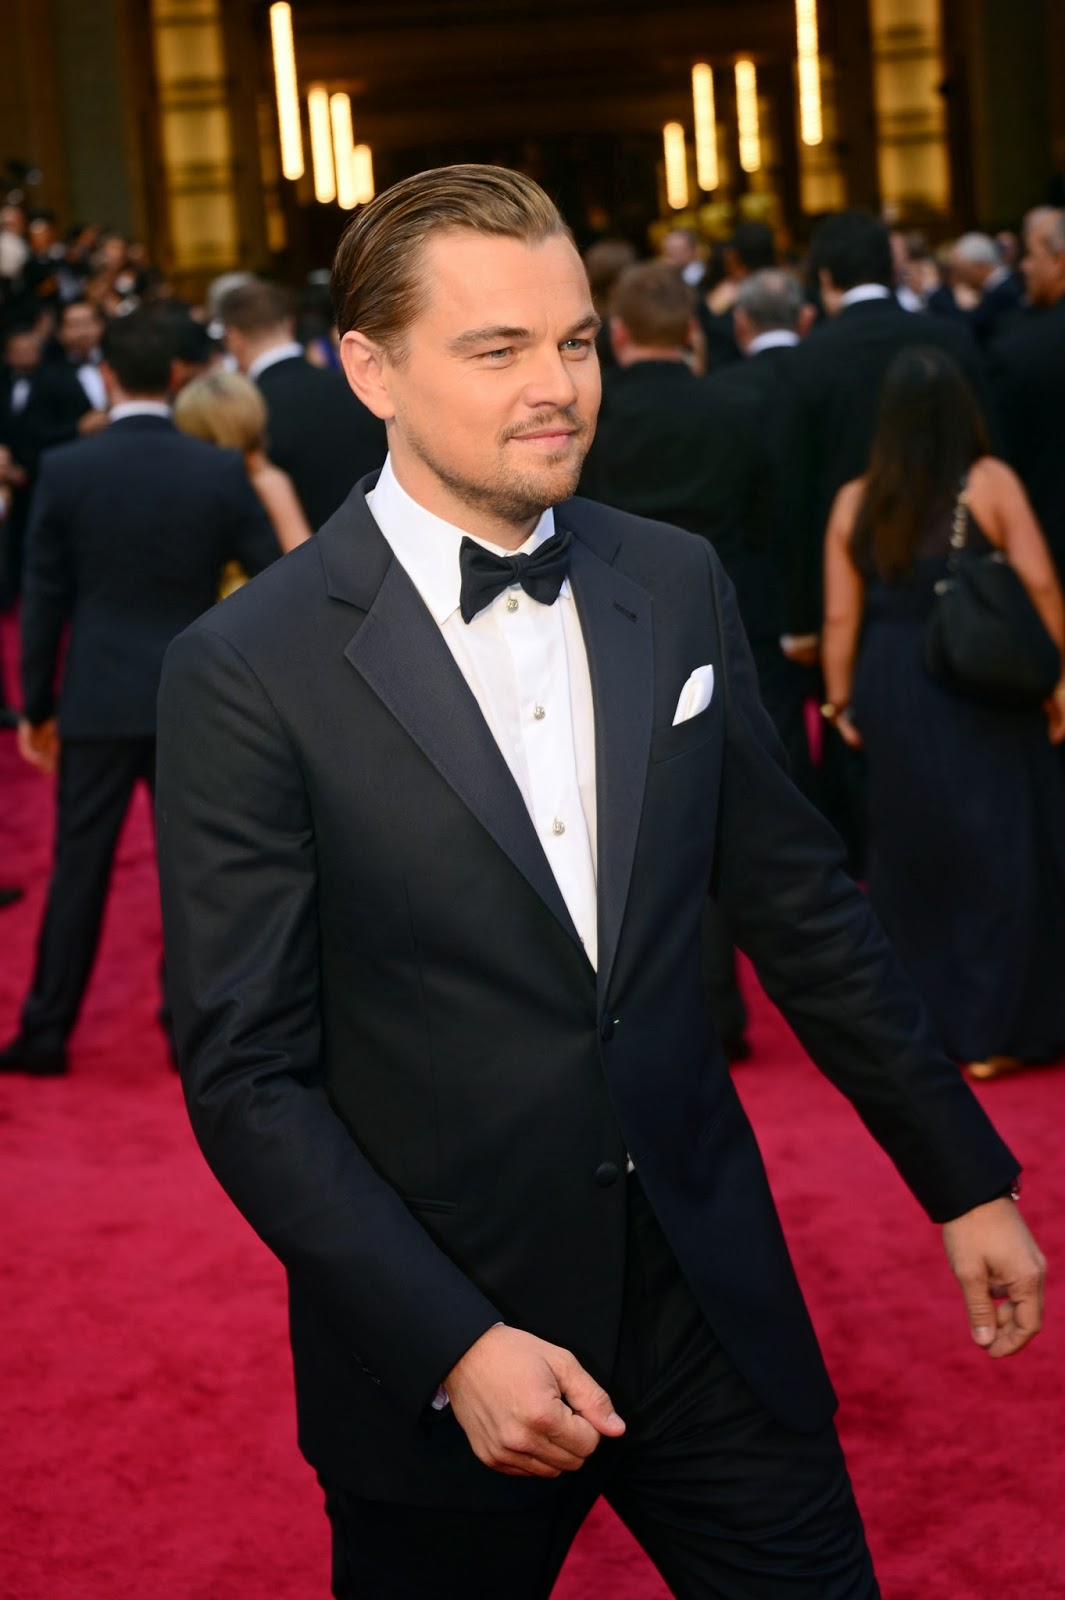 Oscar 2014,  Academy Awards Winners, Awards Winners, Hollywood, Actress, Photo, Ceremony, Showbiz, Angelina Jolie, Entertainment, Film, Movies,  Gravity, California, Oscar Party,